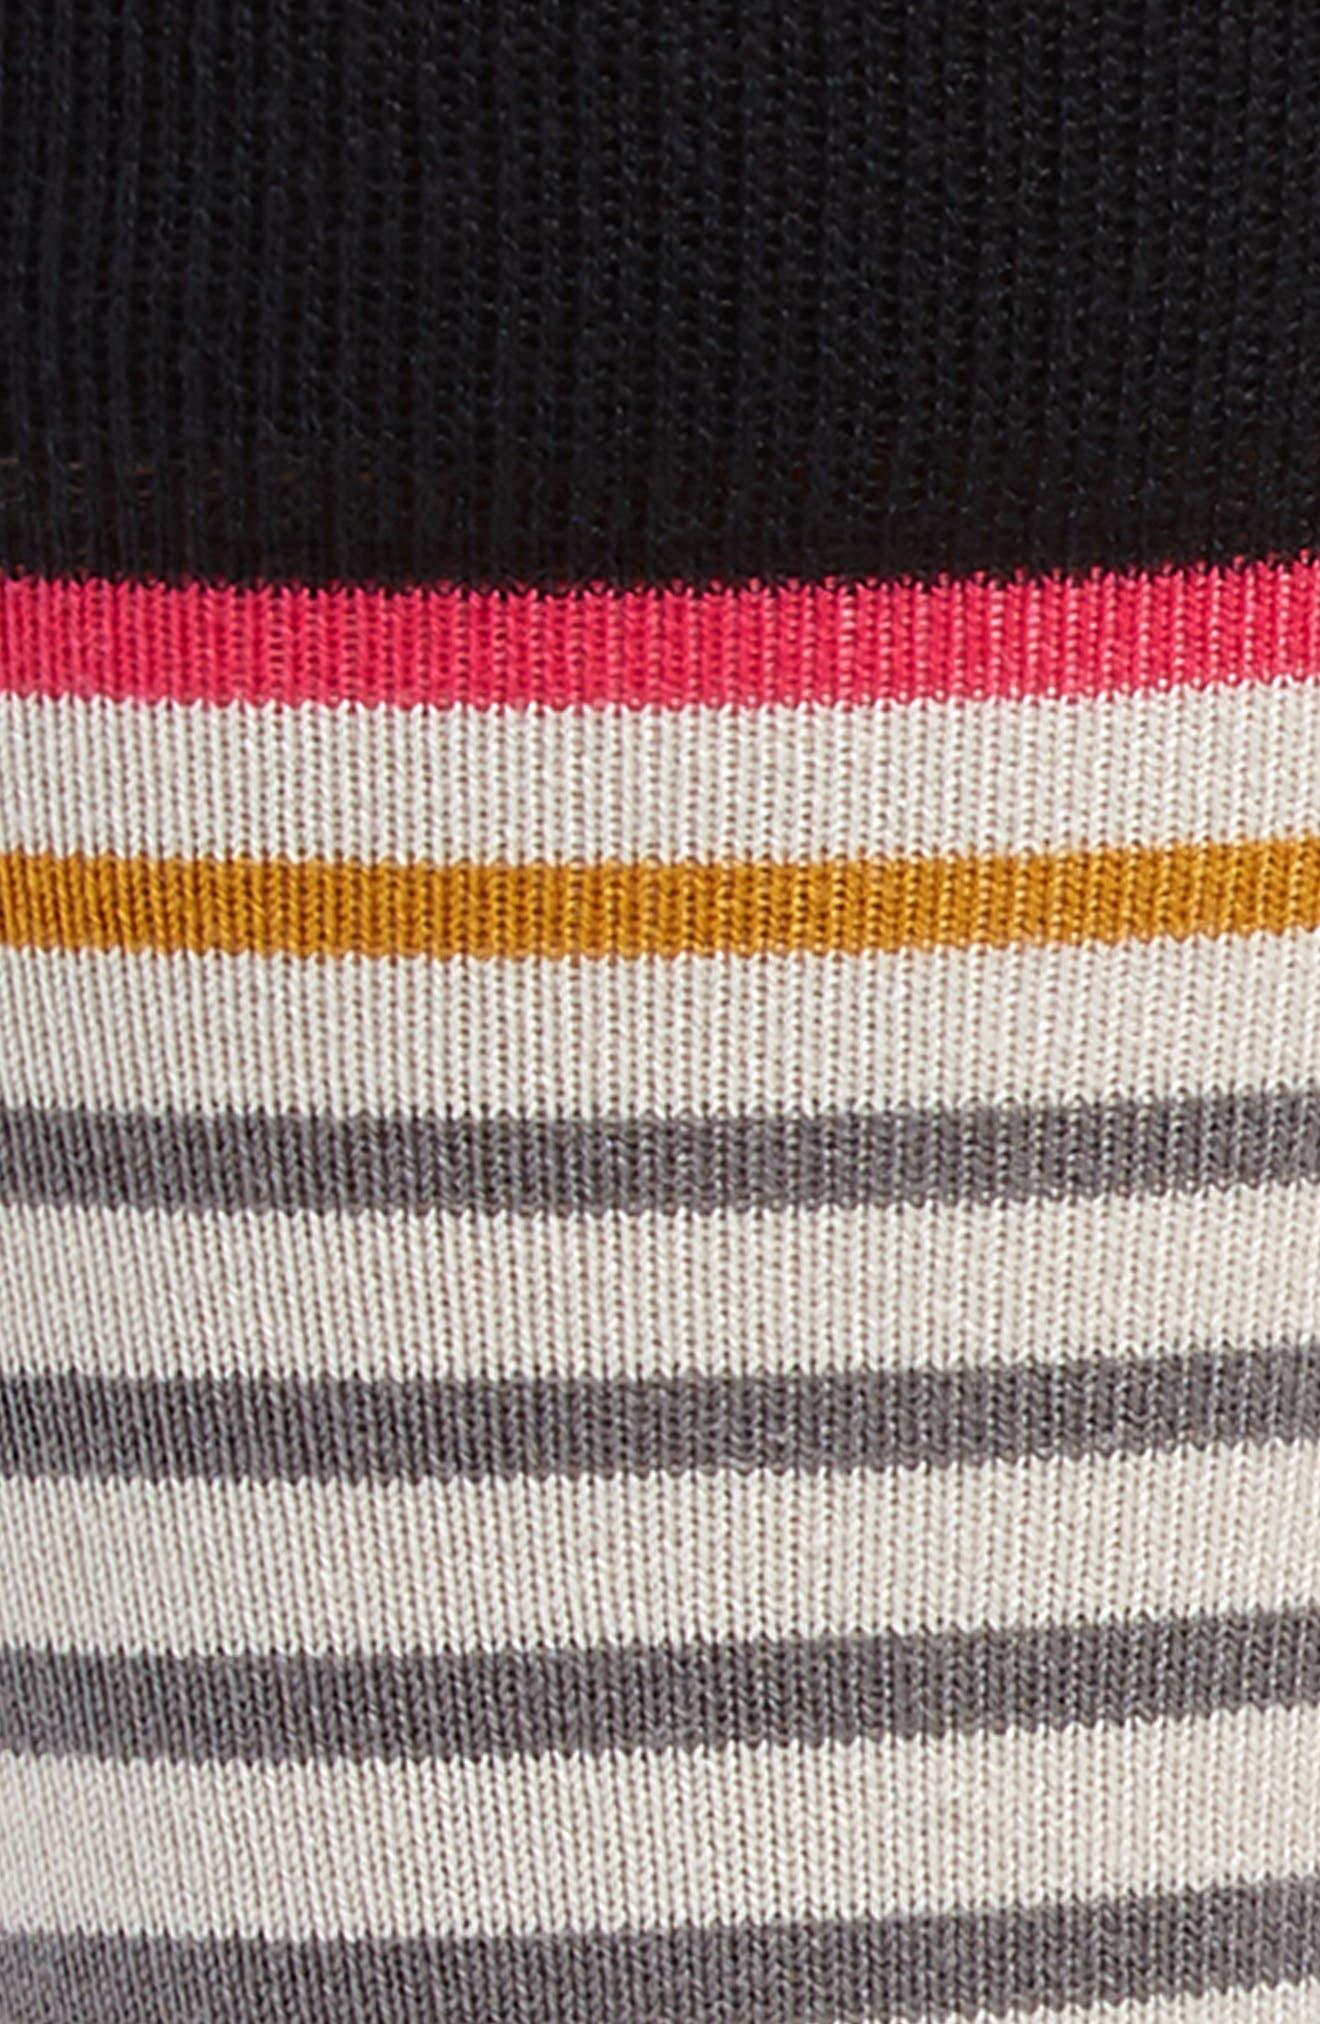 3-Pack Stripe Socks,                             Alternate thumbnail 2, color,                             BLACK/ GREY/ MULTI